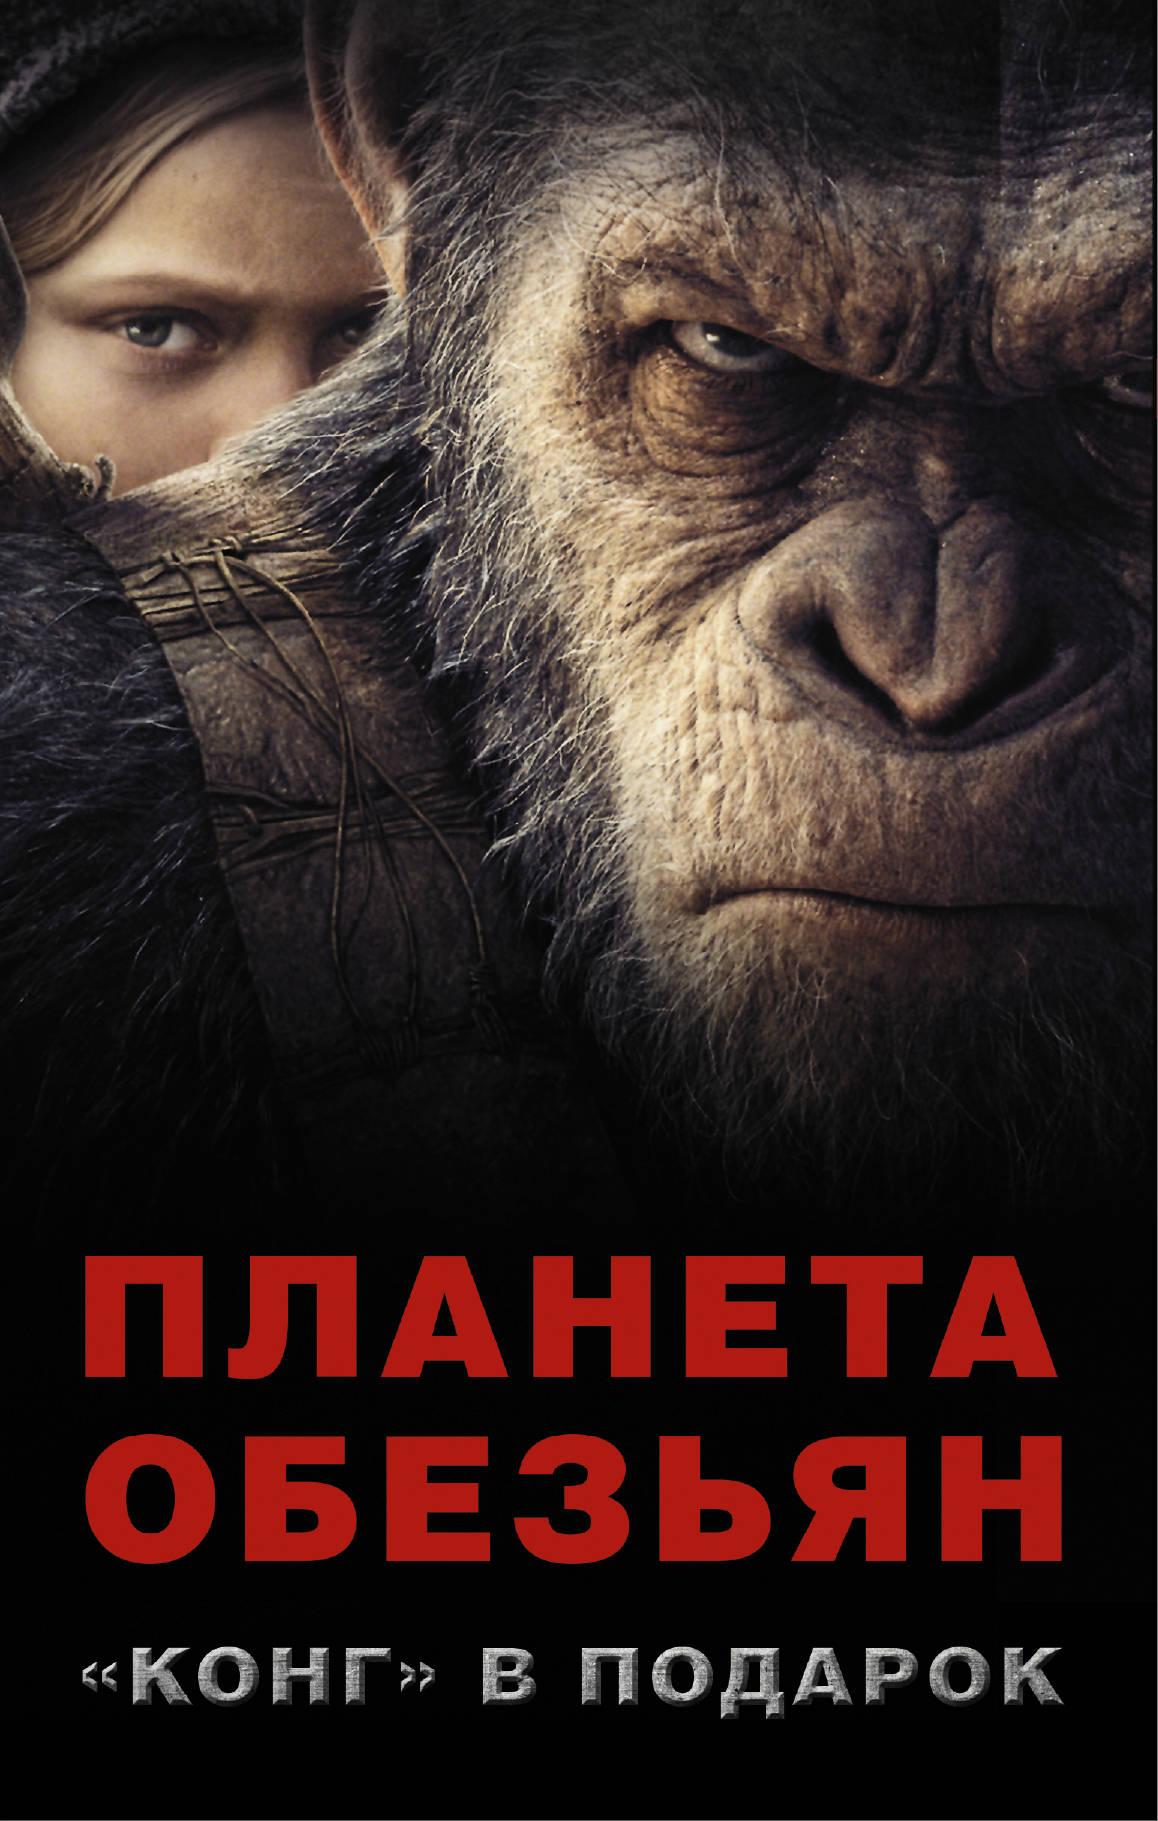 "Д. Абнетт,К. Андерсон,Г. Кокс,Г. Киз,Т. Леббон Планета обезьян + ""Конг"" в подарок (комплект из 4-х книг)"